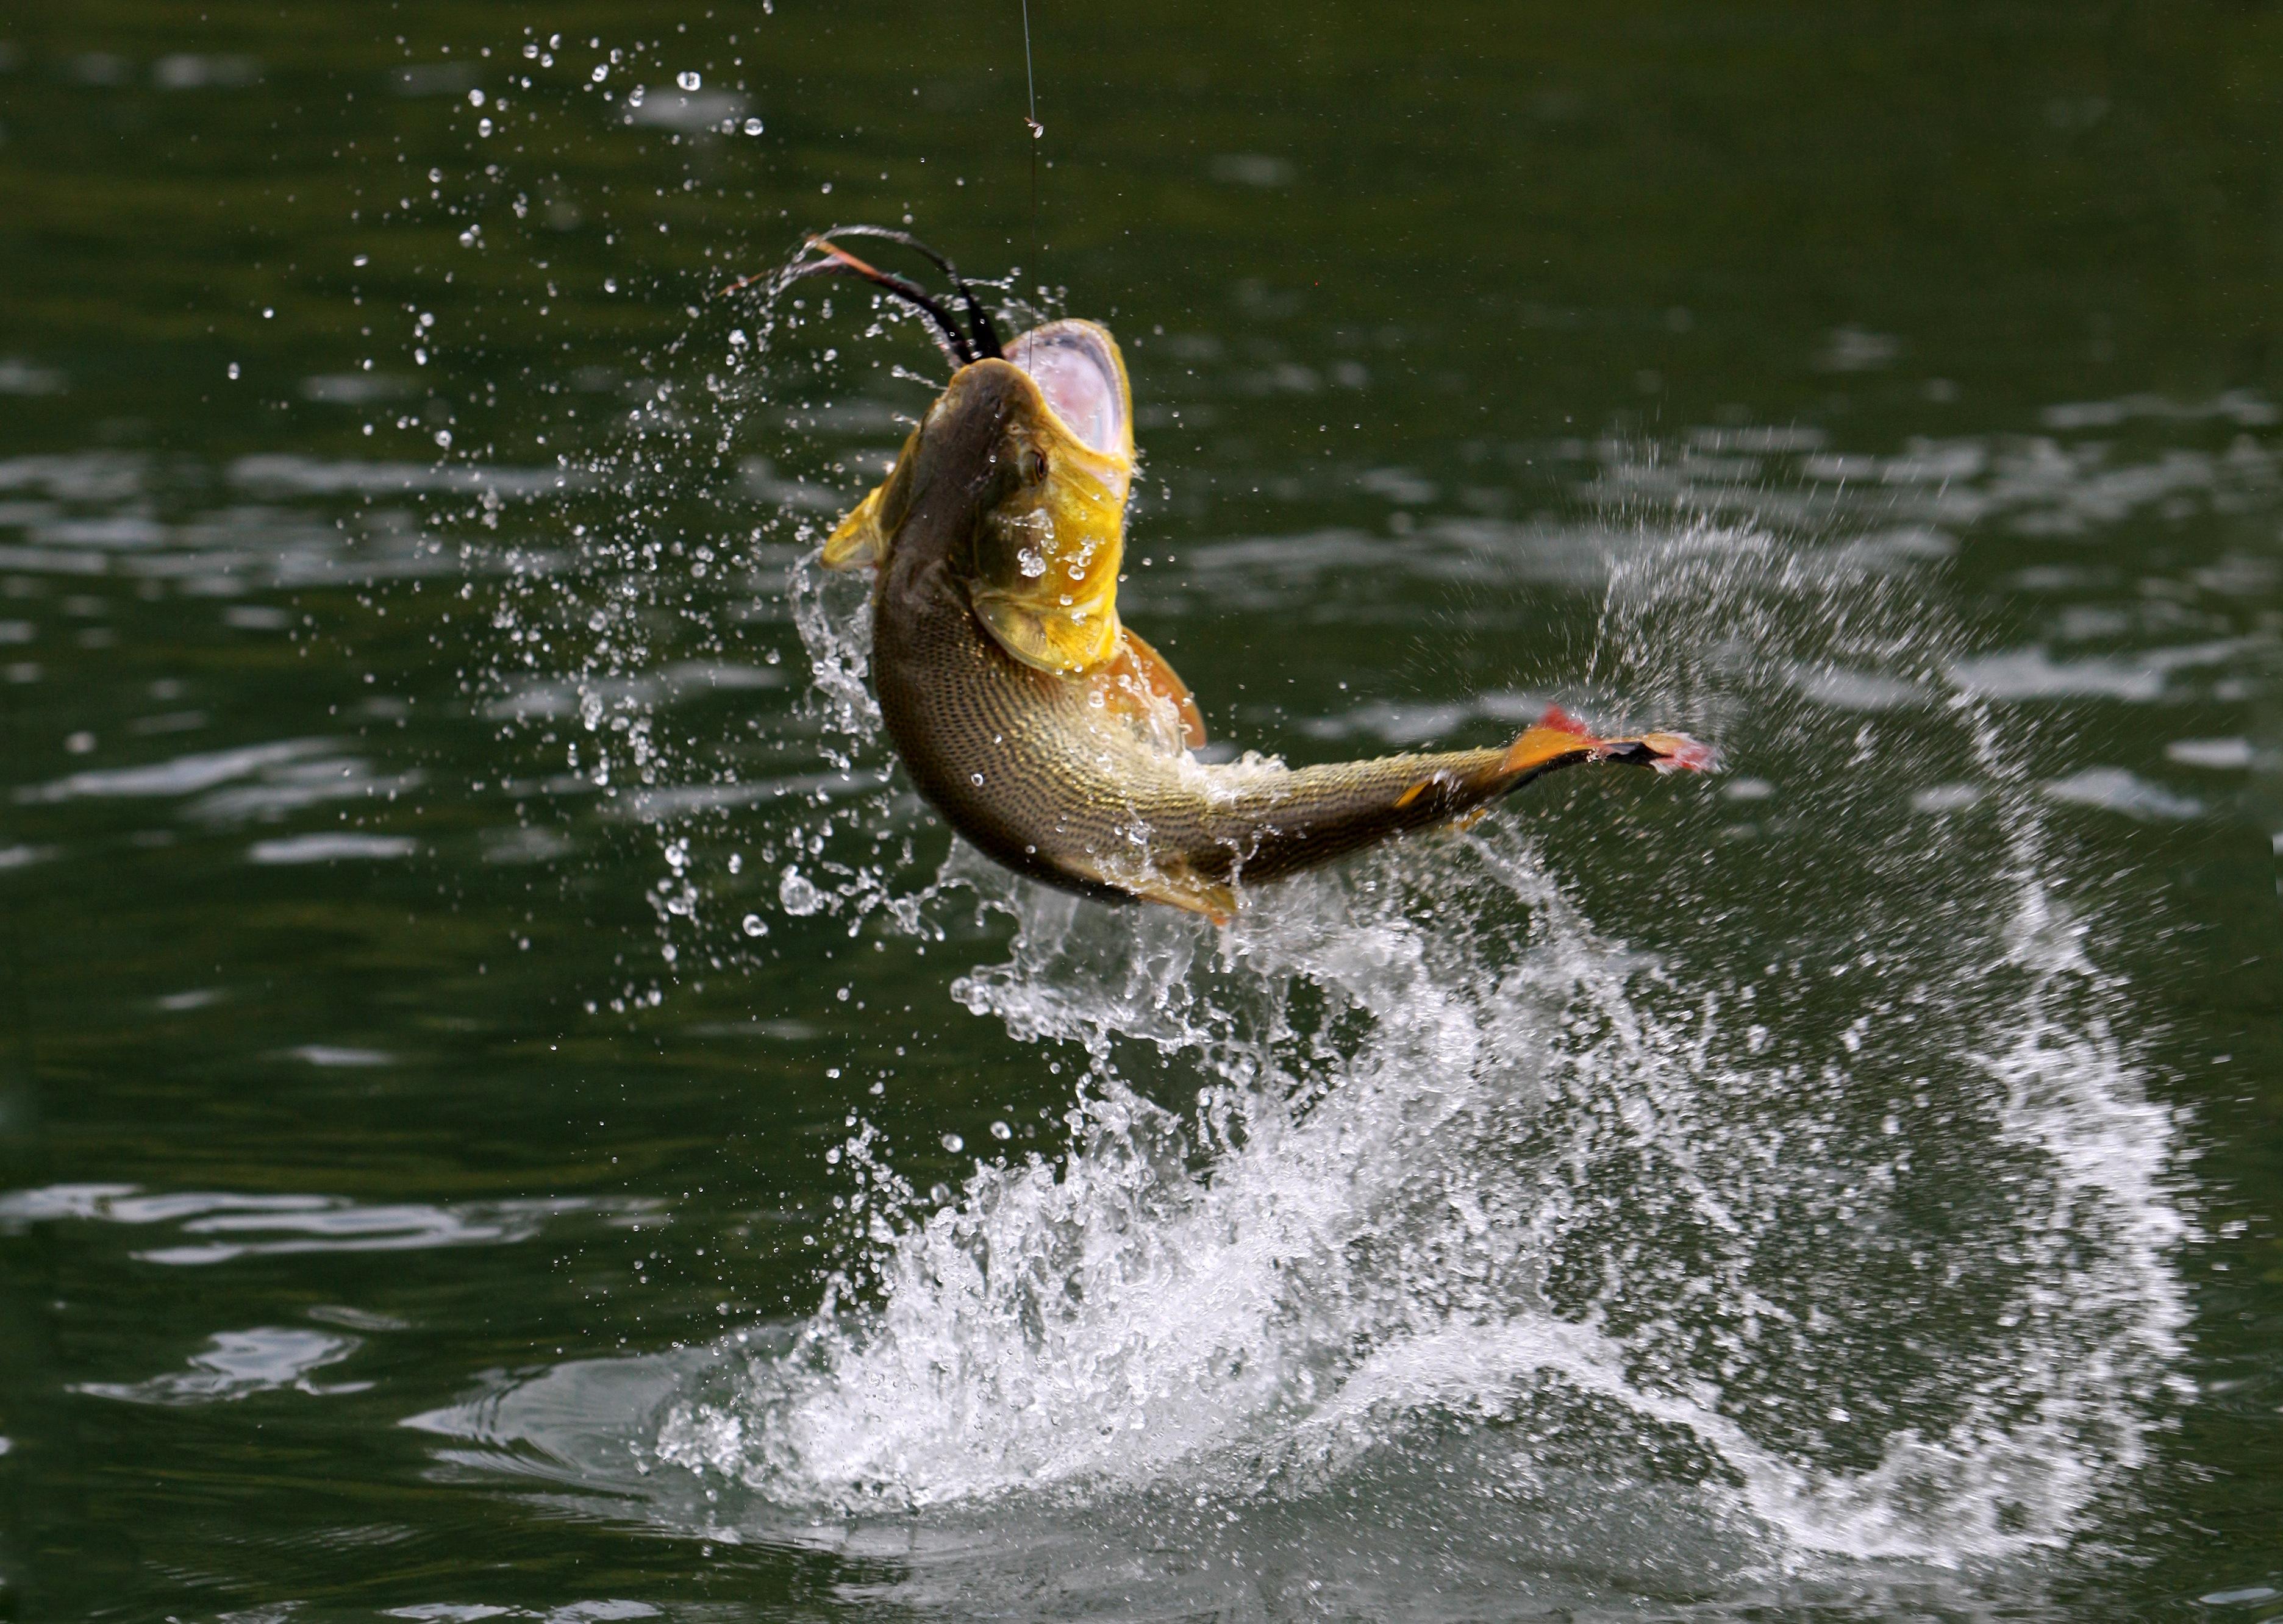 bass fish fishing drops g wallpaper background 3744x2664